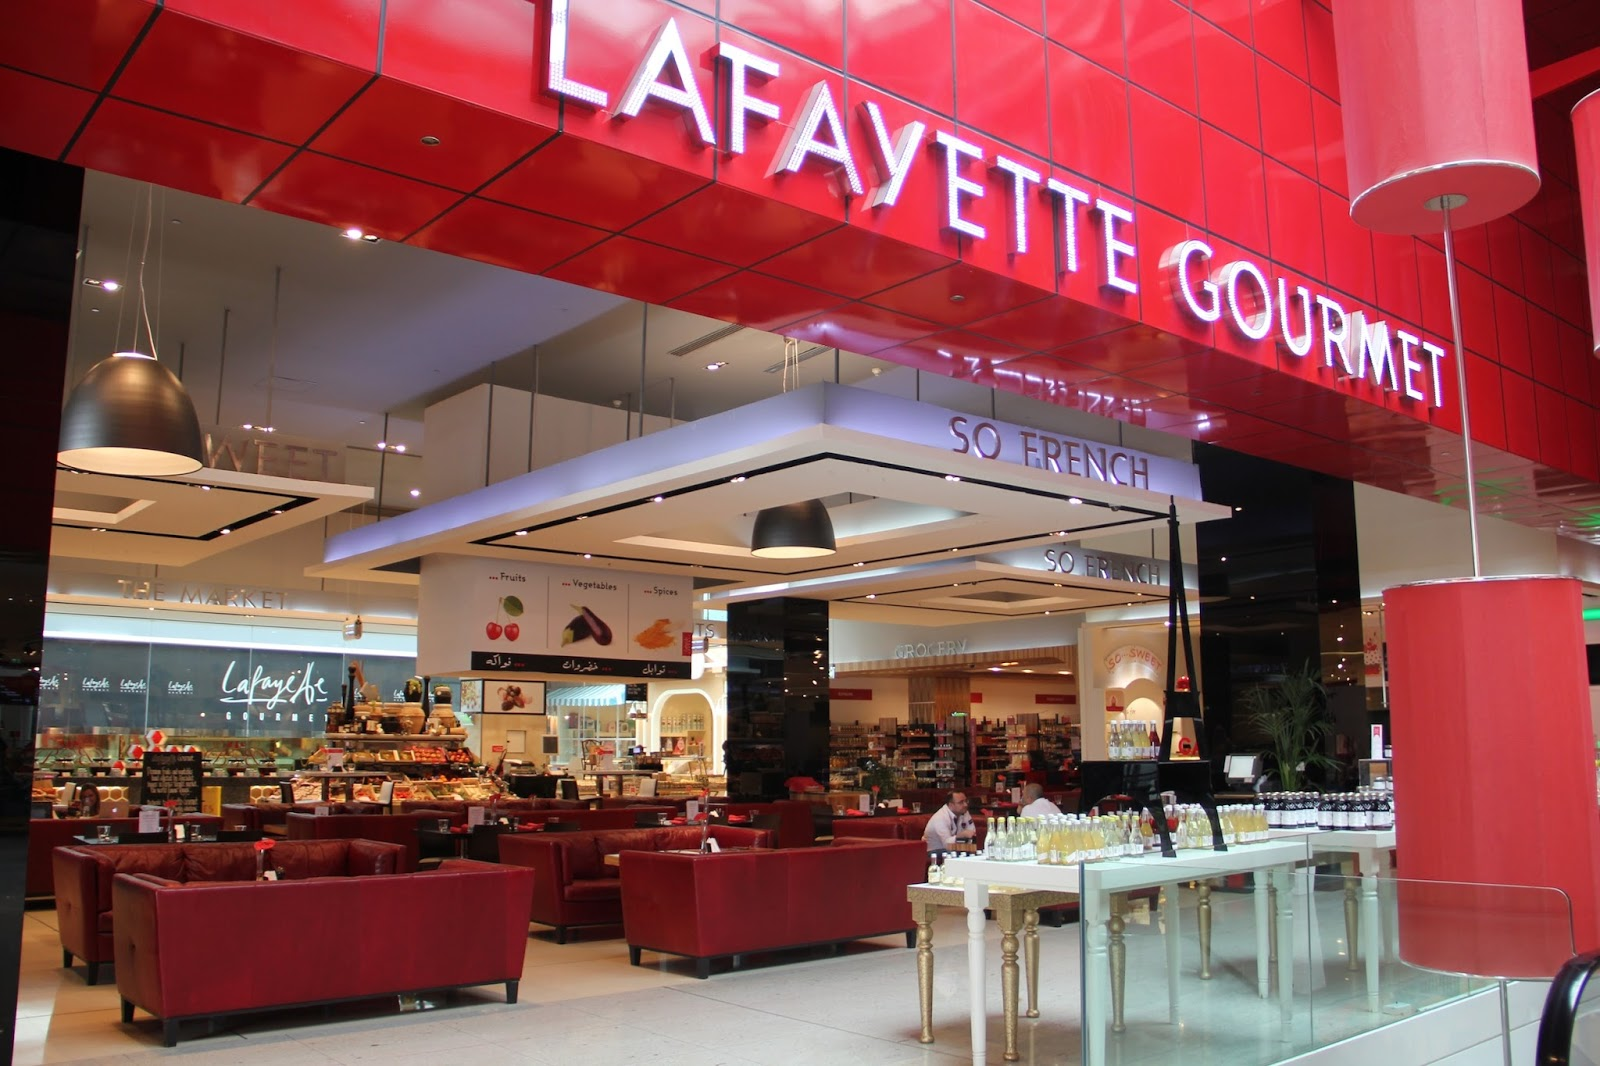 Restaurant Le Petit Gourmet Paris